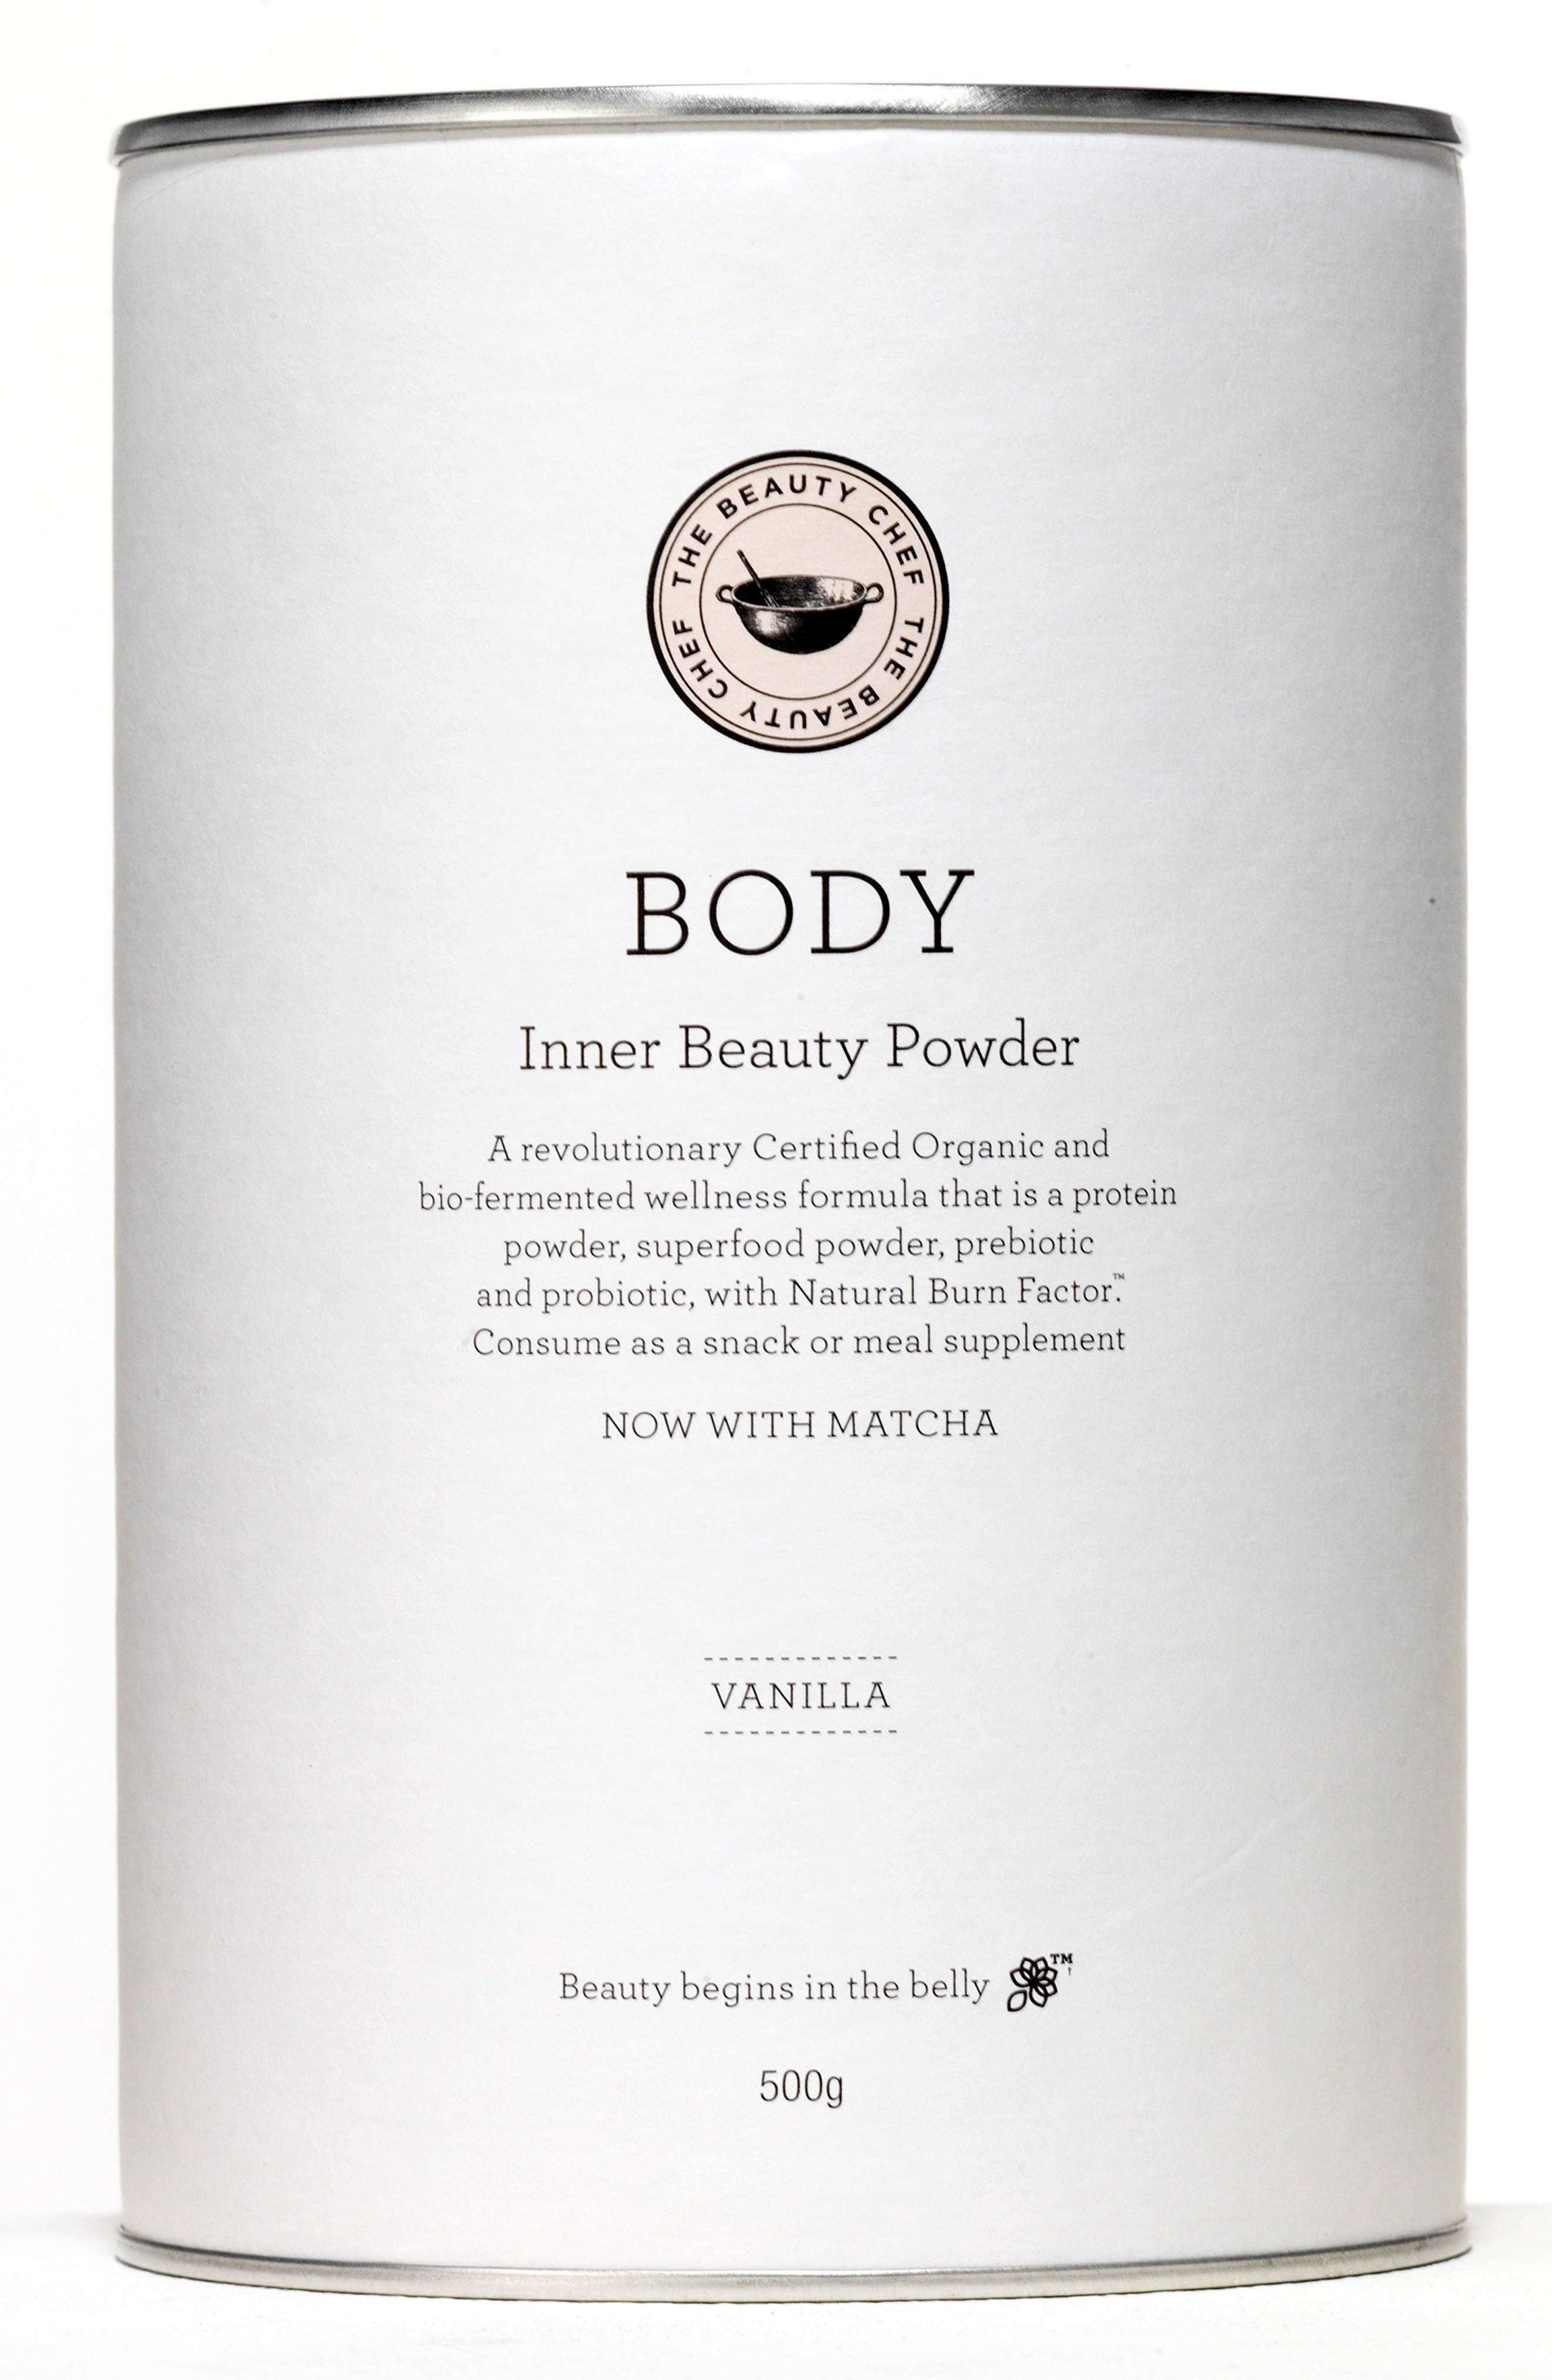 Body Inner Beauty Powder with Matcha,                             Main thumbnail 1, color,                             VANILLA WITH MATCHA